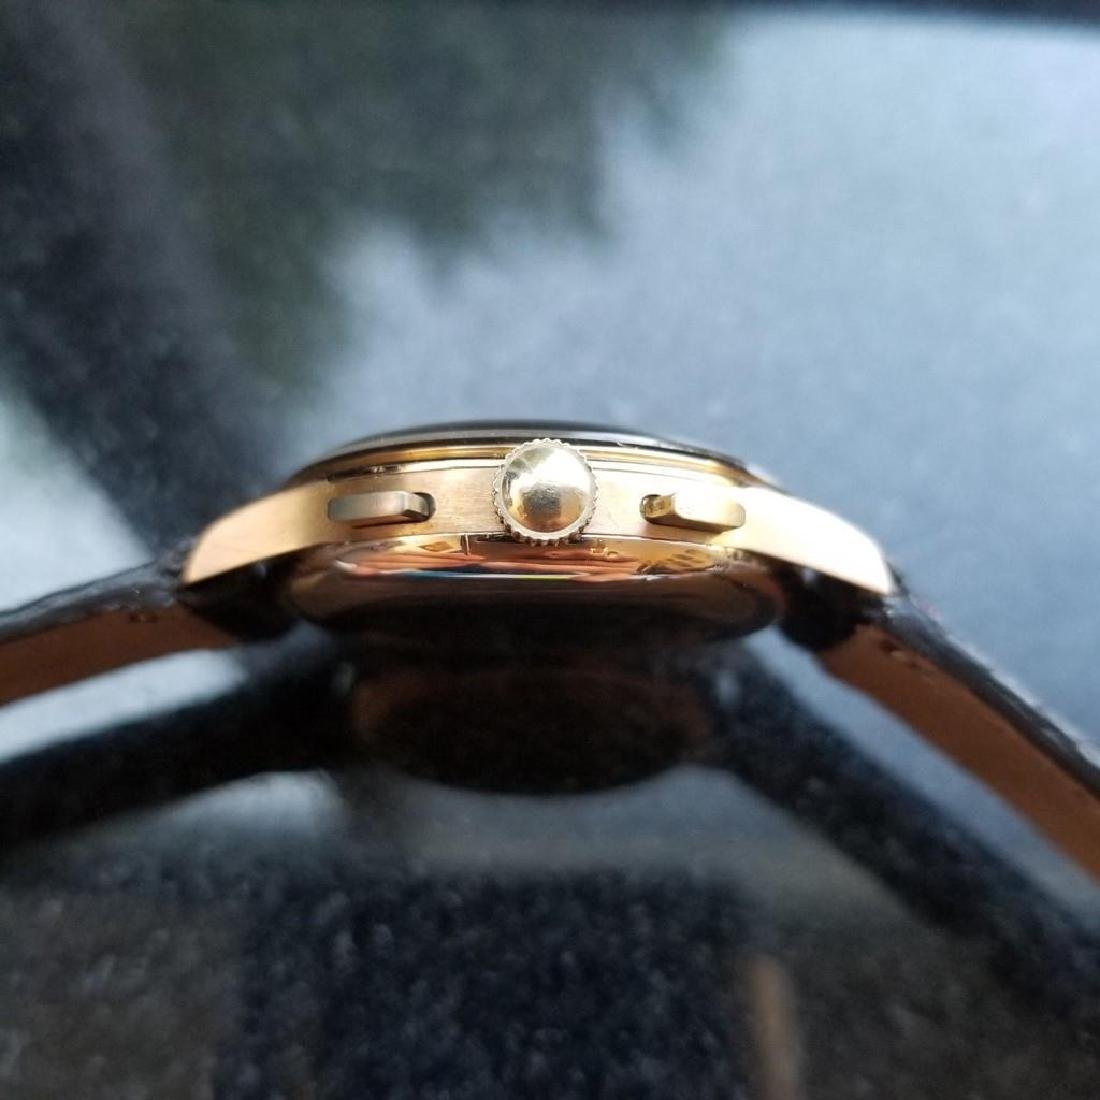 BREITLING Men's 18K Solid Rose Gold Chronograph ref.787 - 5